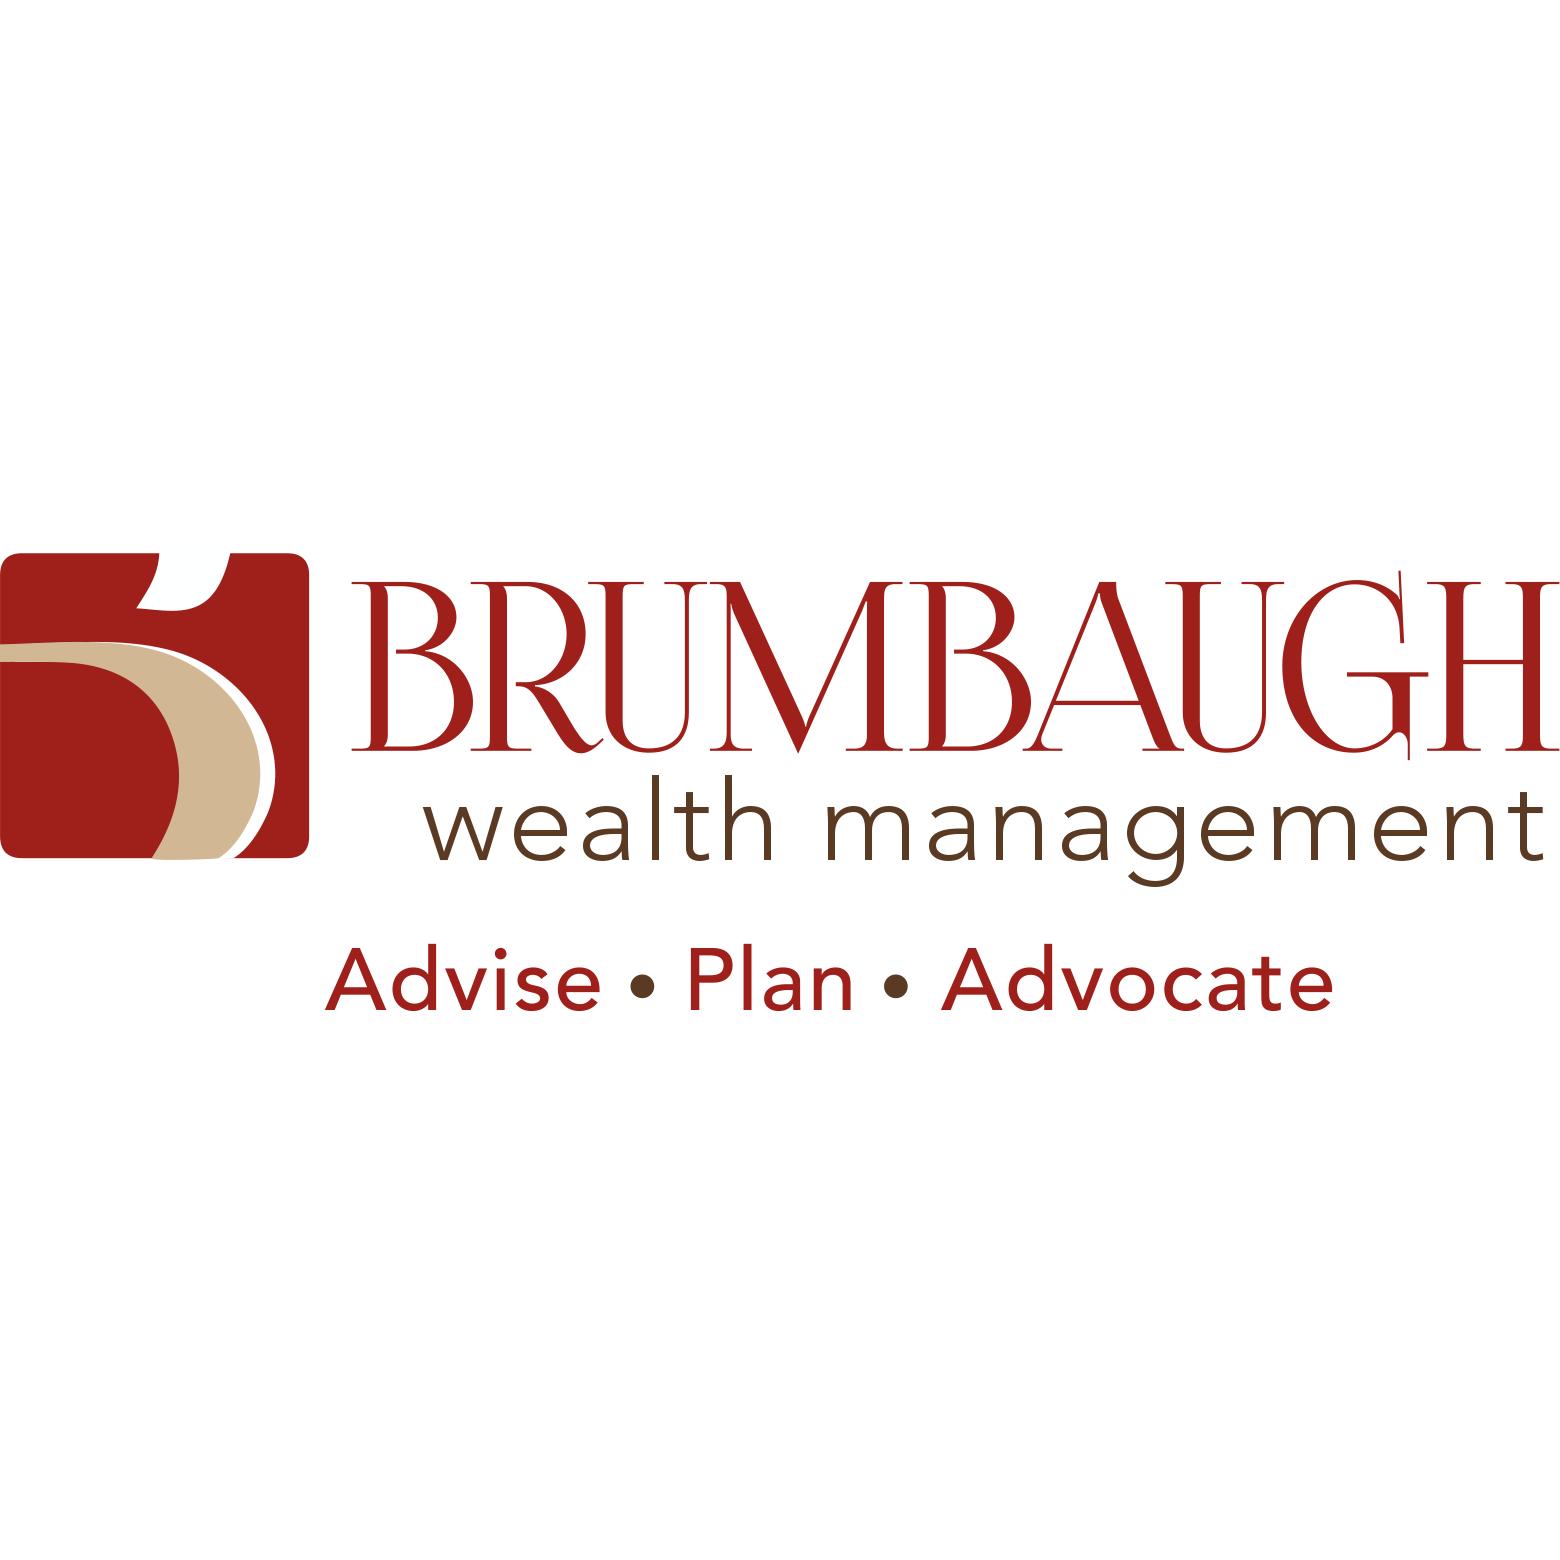 Brumbaugh Wealth Management